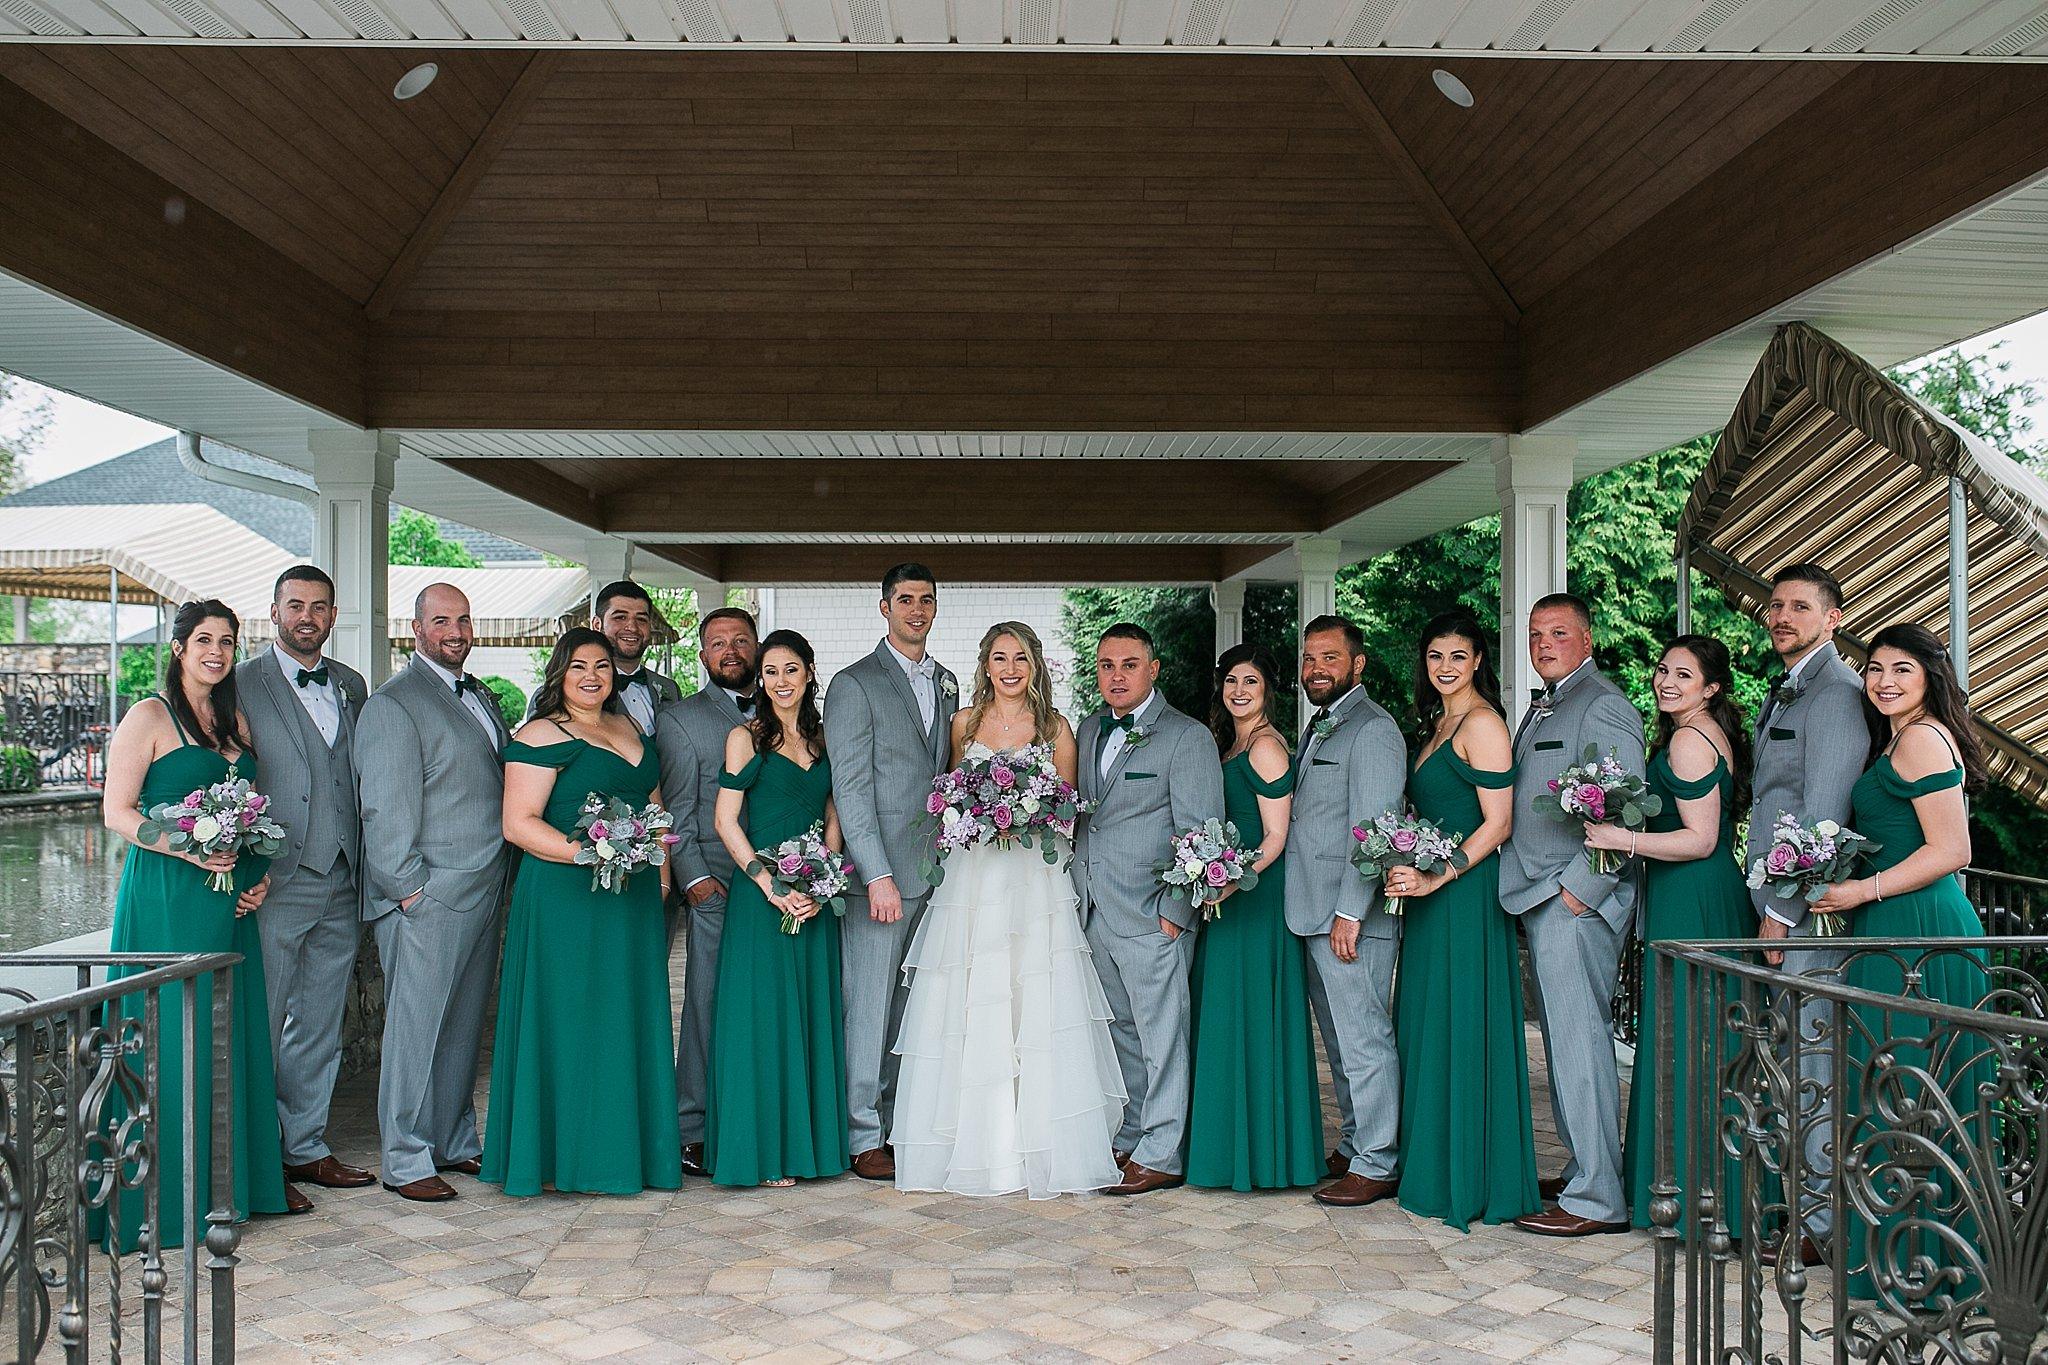 West Hills Country Club Wedding Hudson Valley Wedding Photographer Sweet Alice Photography 44.jpg